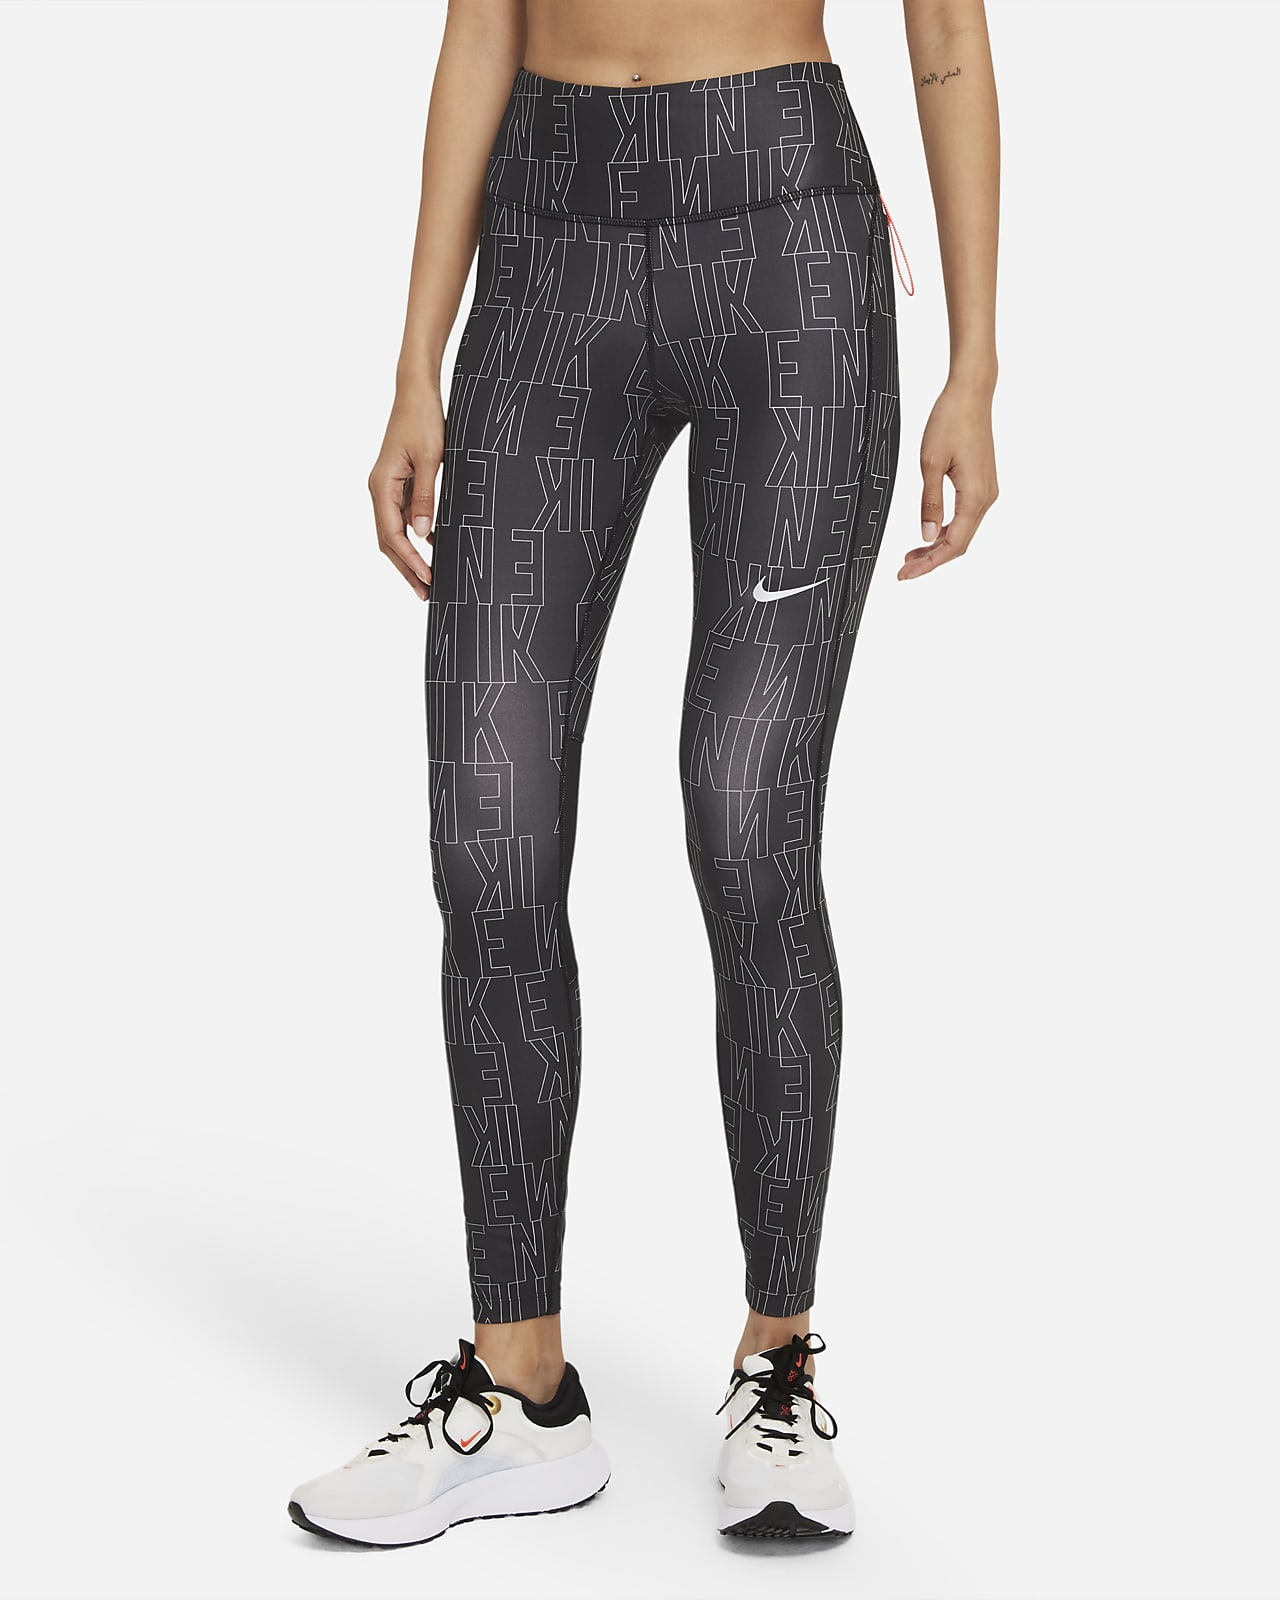 Nike Dri-FIT Run Division Epic Fast középmagas derekú női futóleggings